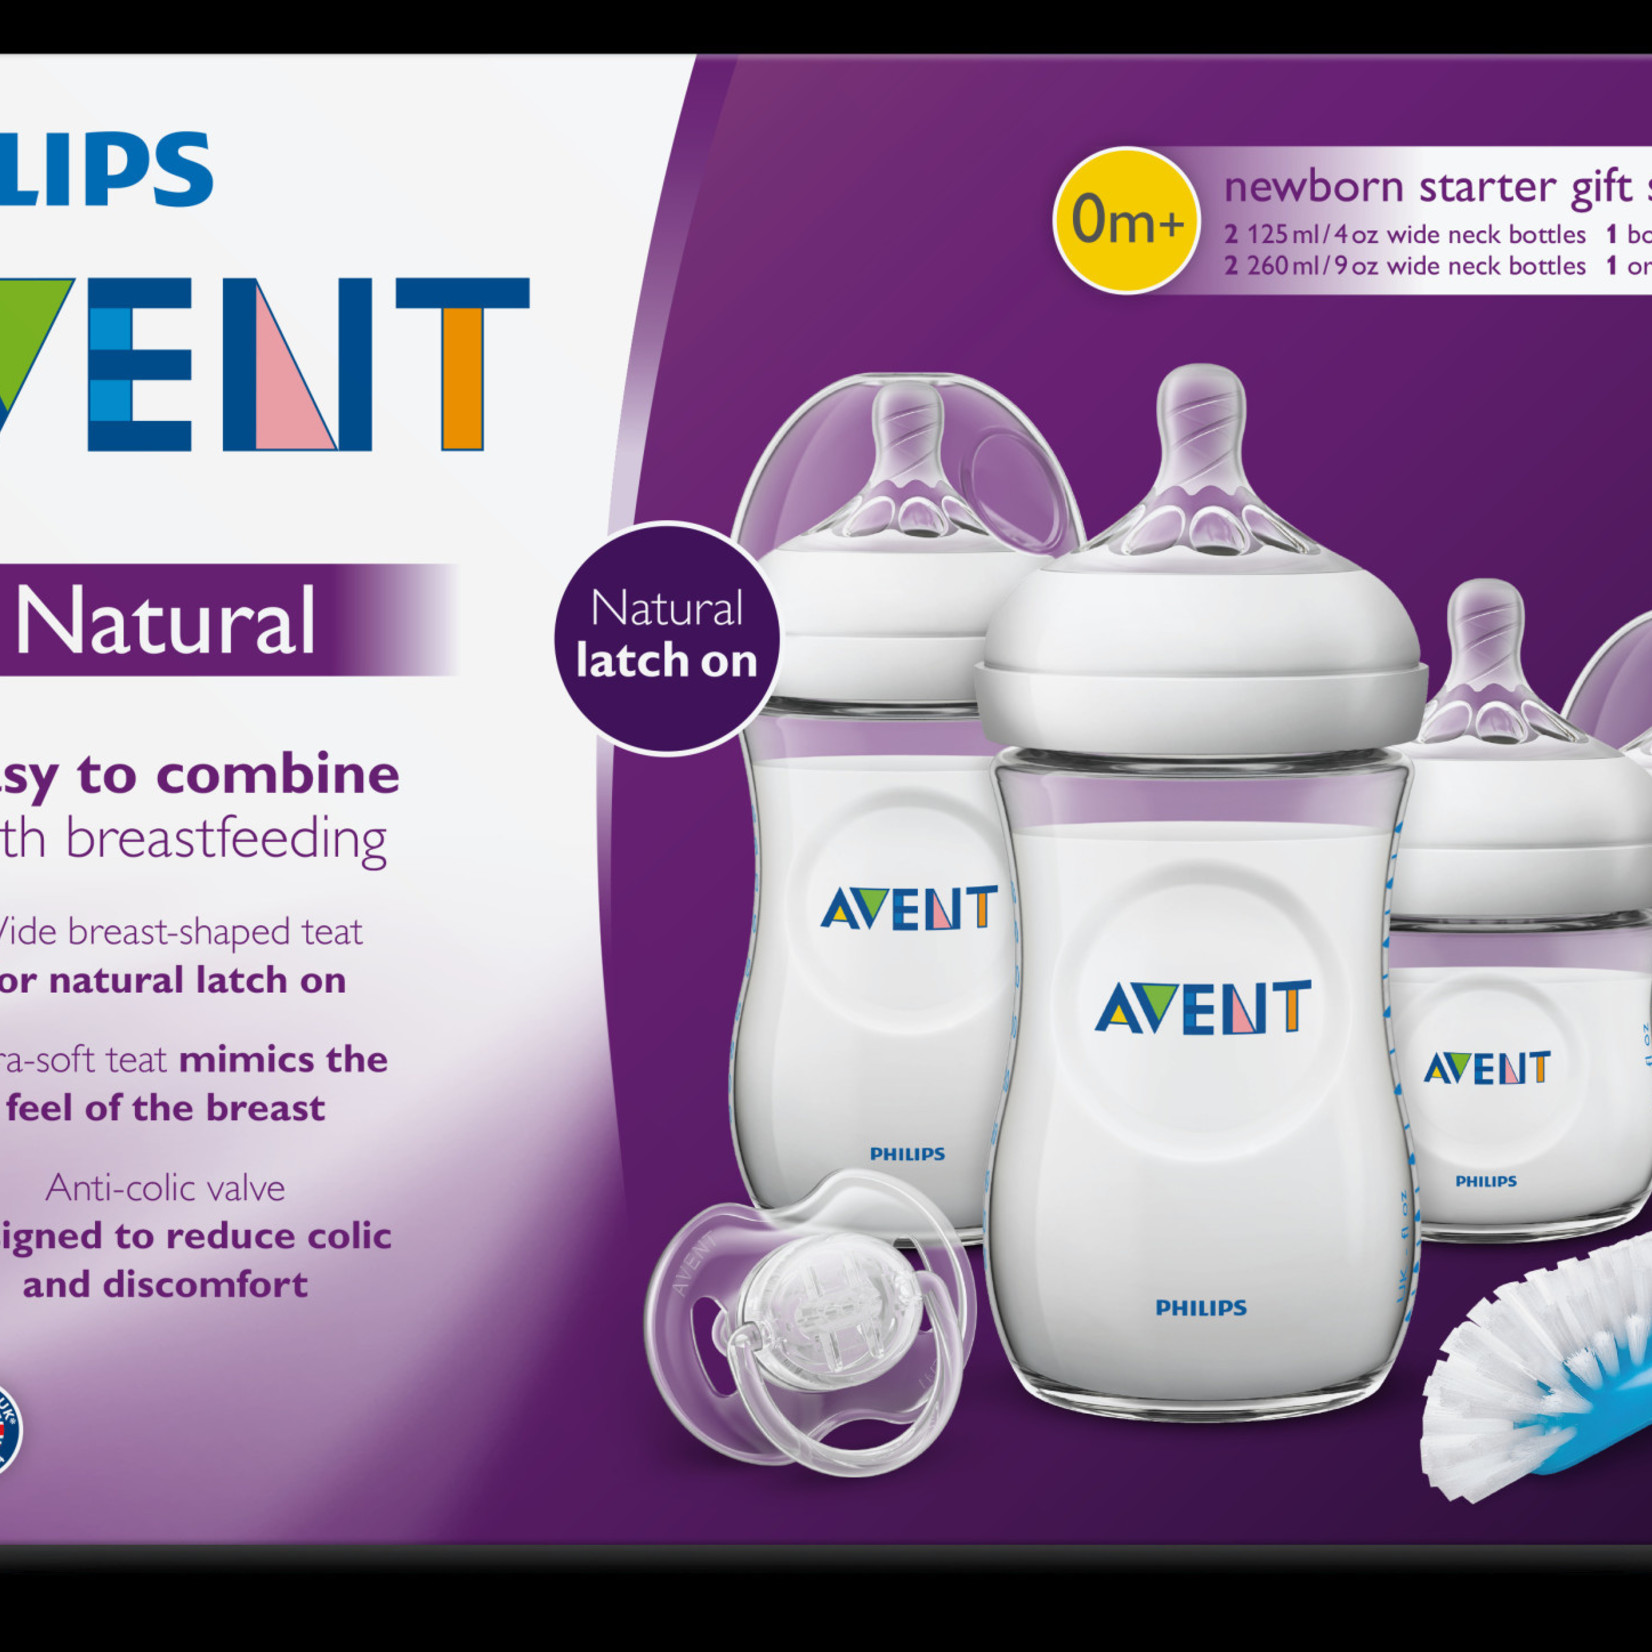 Philips-Avent Natural  starterset